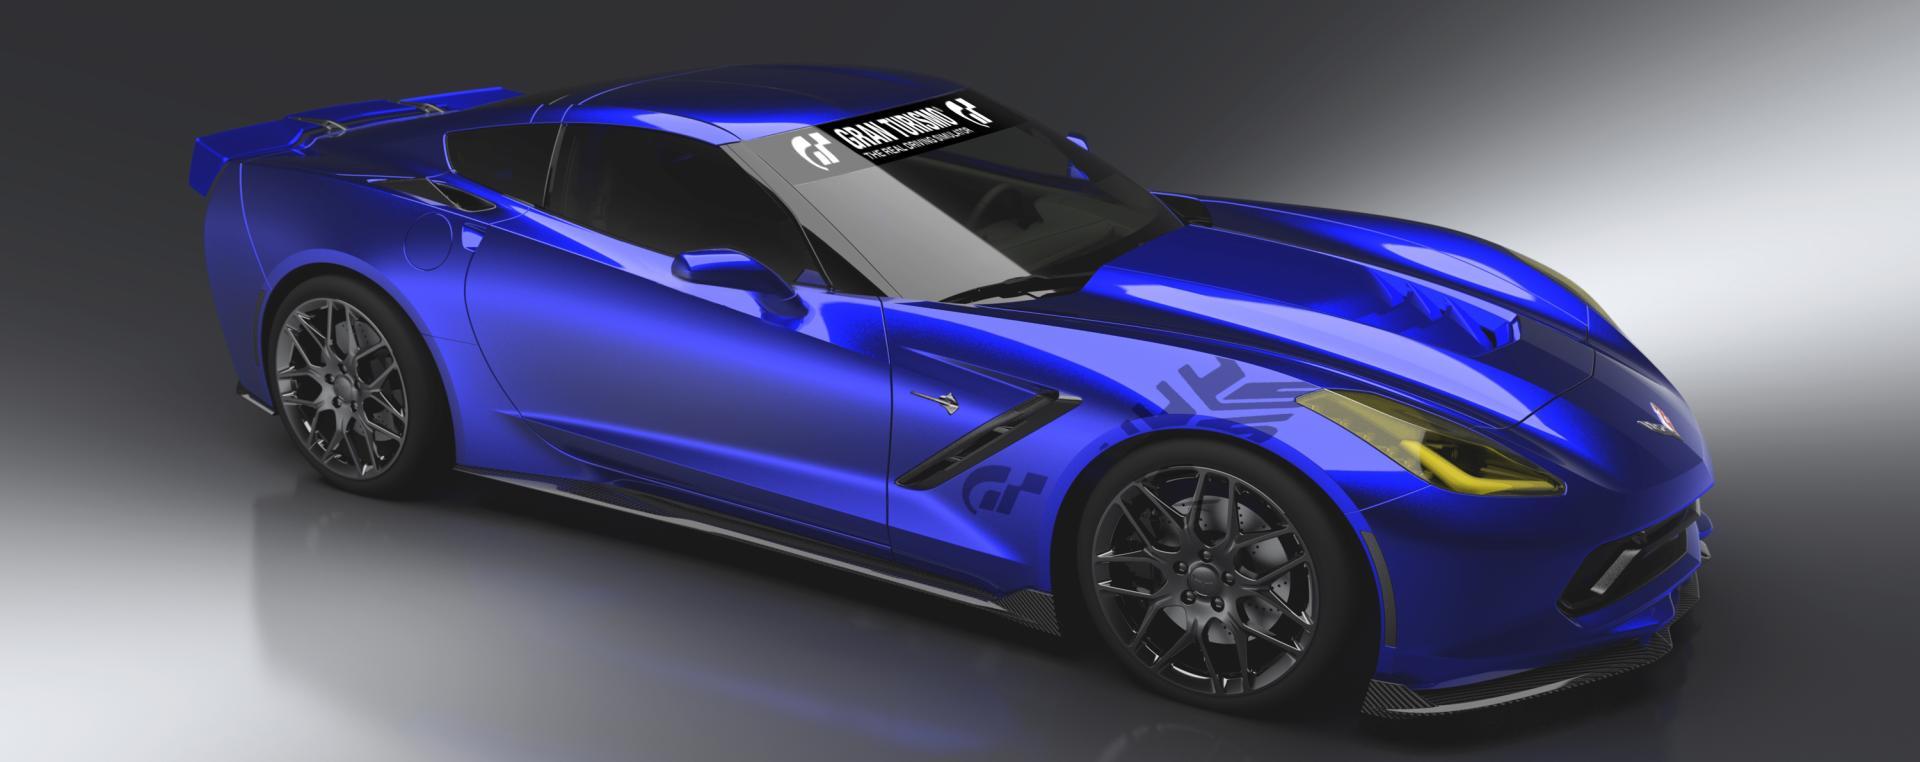 2013 Chevrolet Corvette Stingray Gran Turismo Concept News